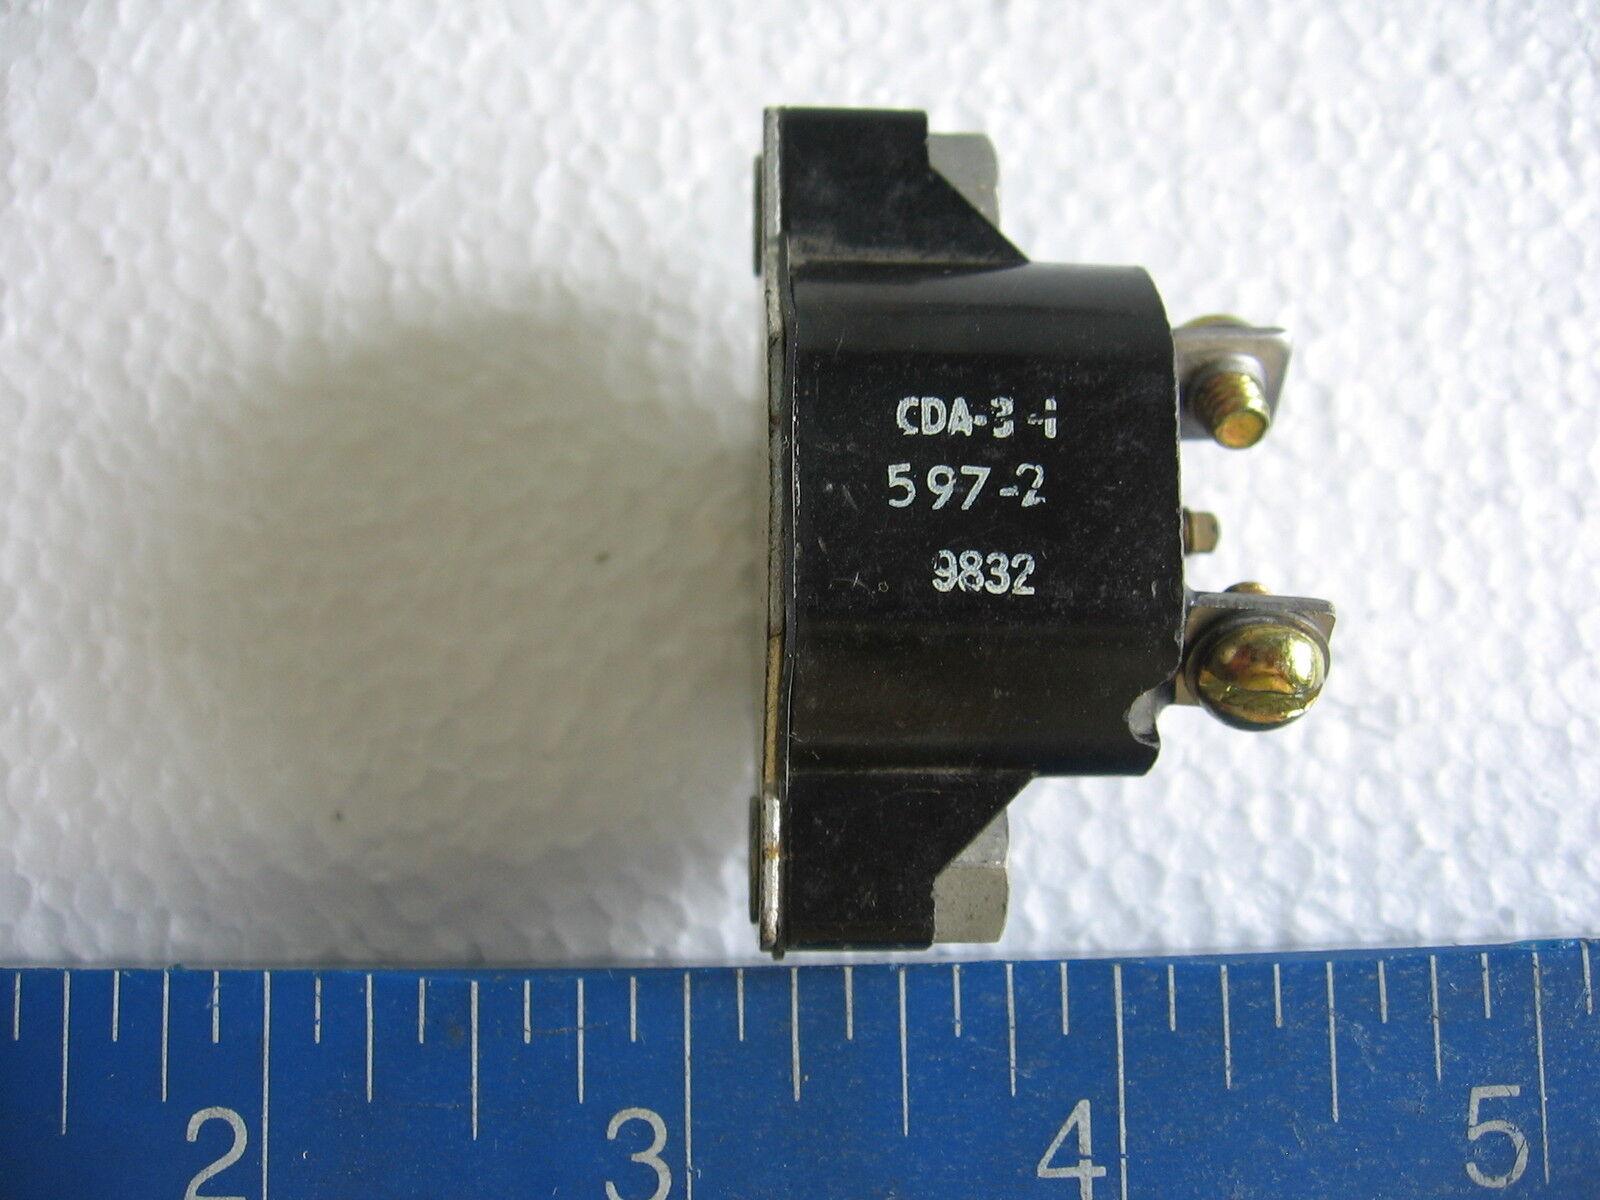 Caterpillar CDA-10-1 Automatic Reset 10 amp Circuit Breaker Texas Inst. Klixon